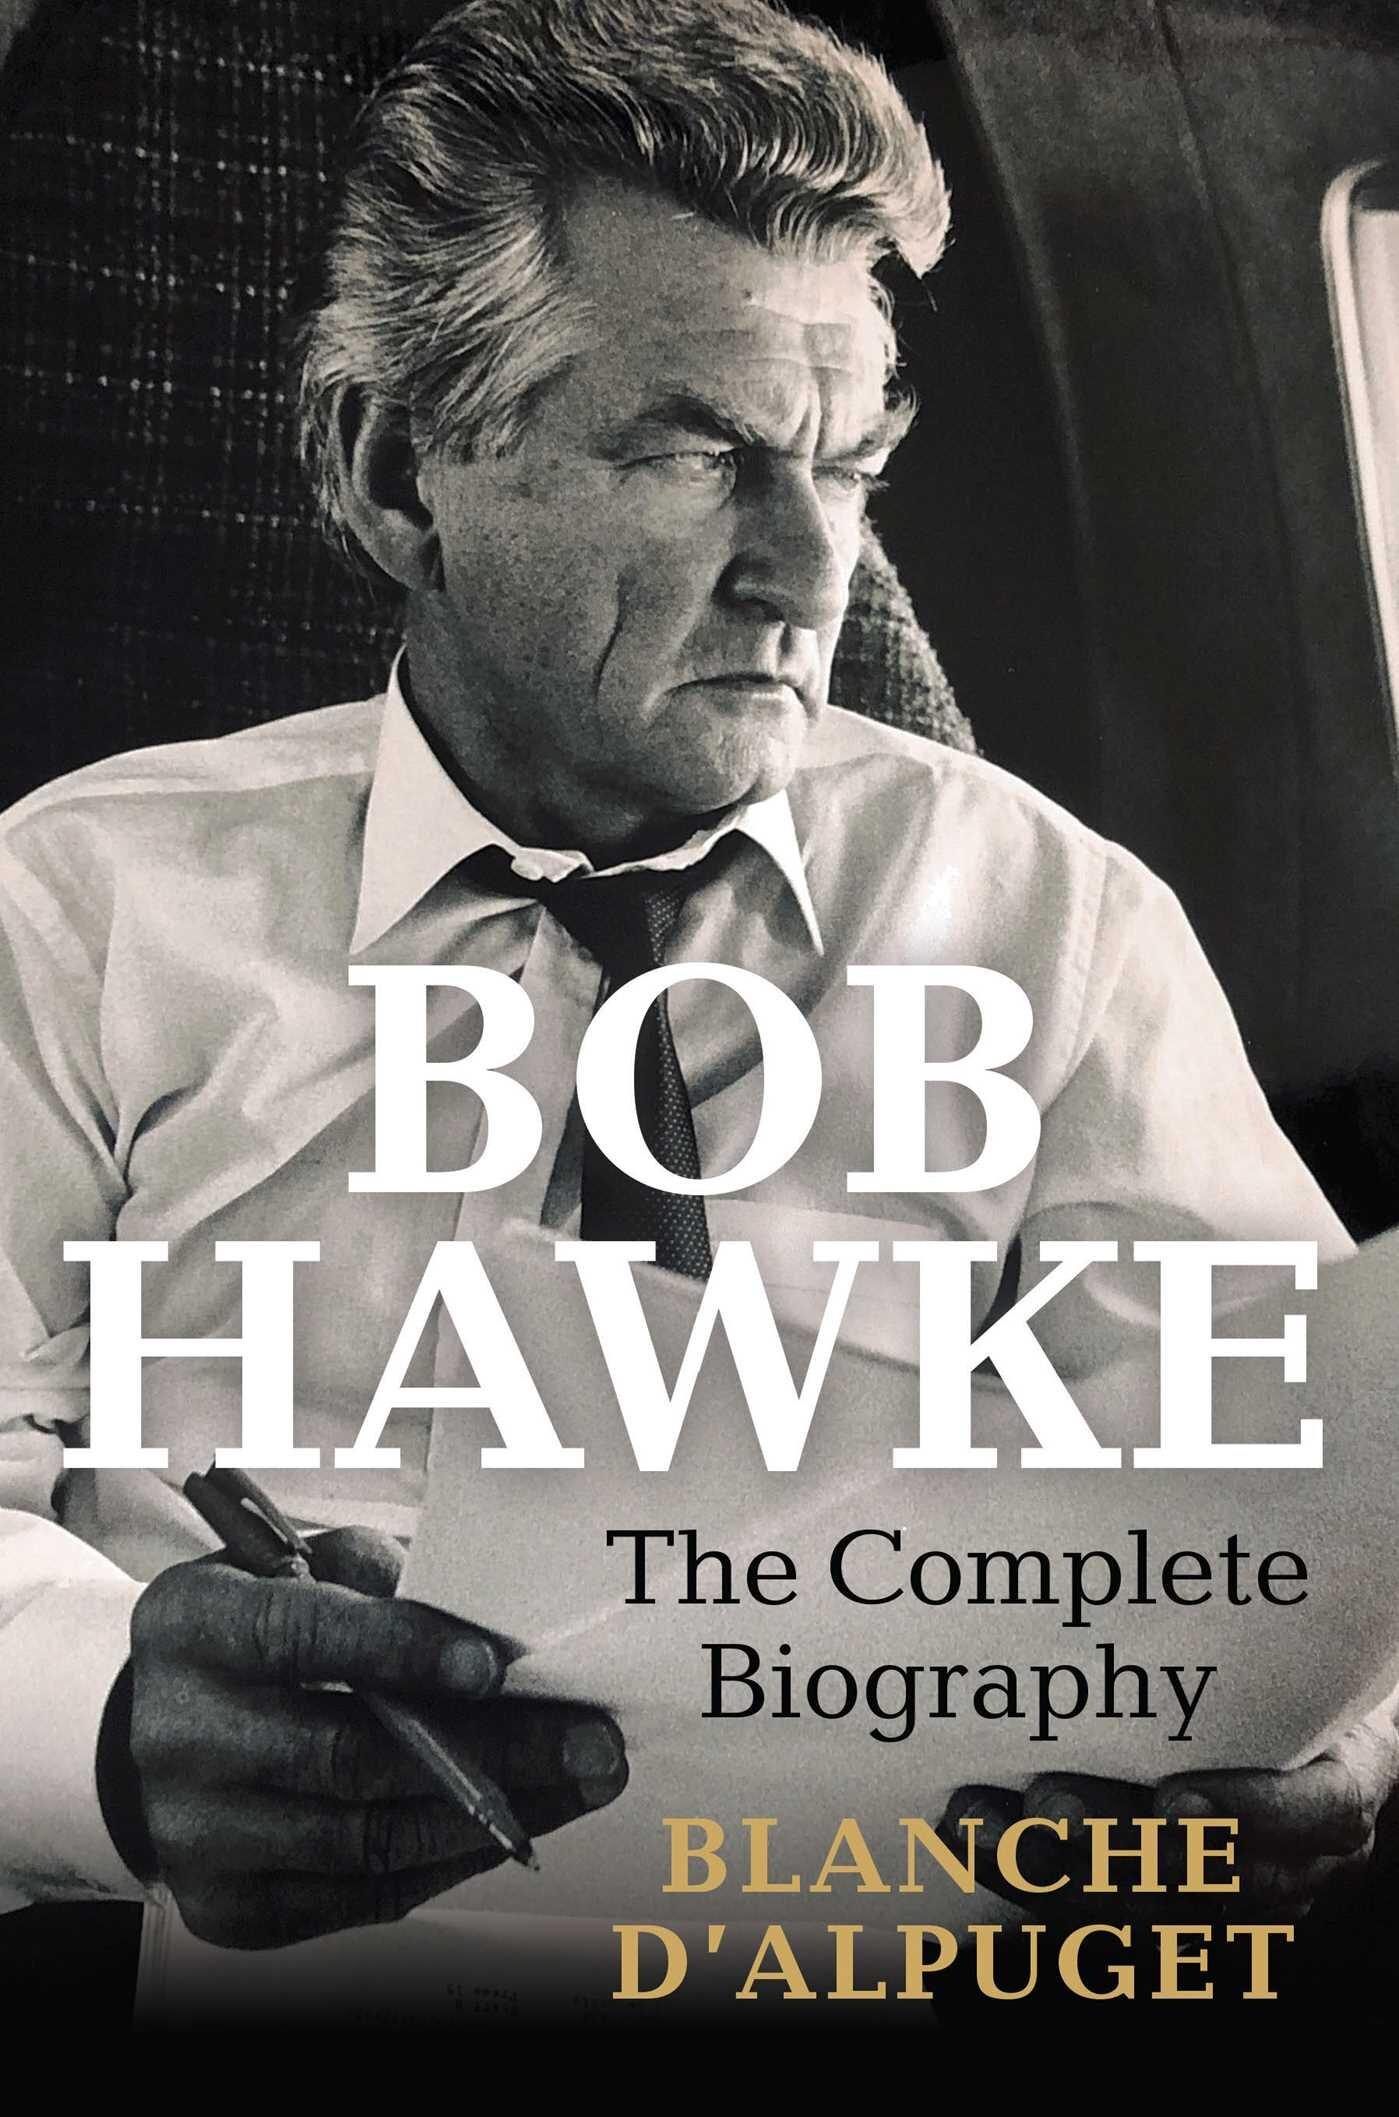 bob hawke d'alpuget.jpeg